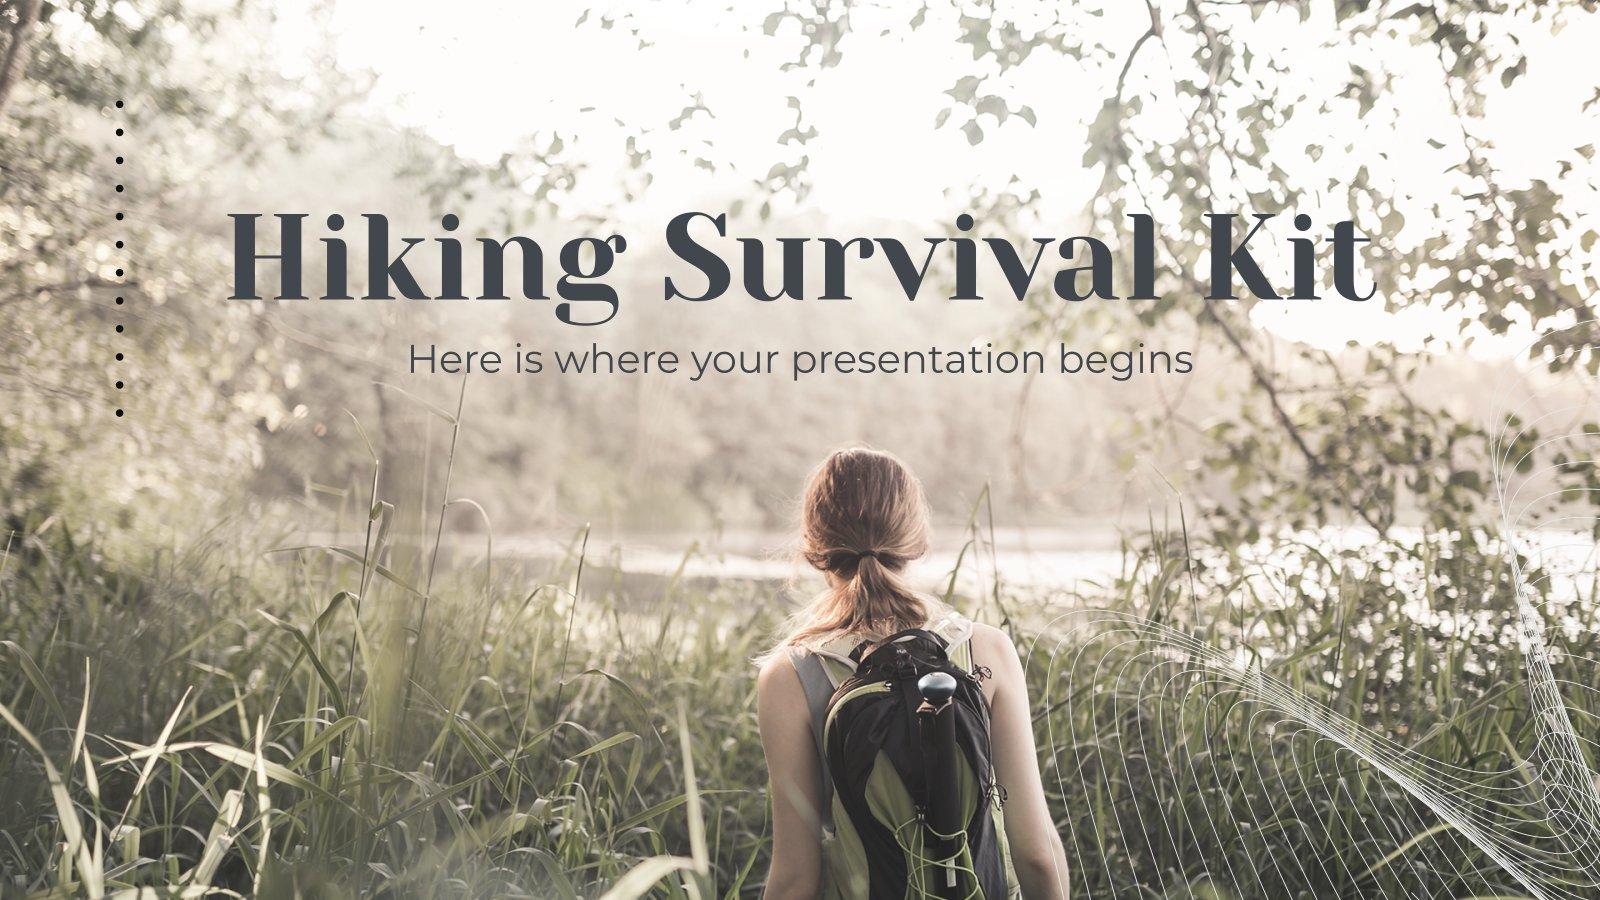 Hiking Survival Kit presentation template